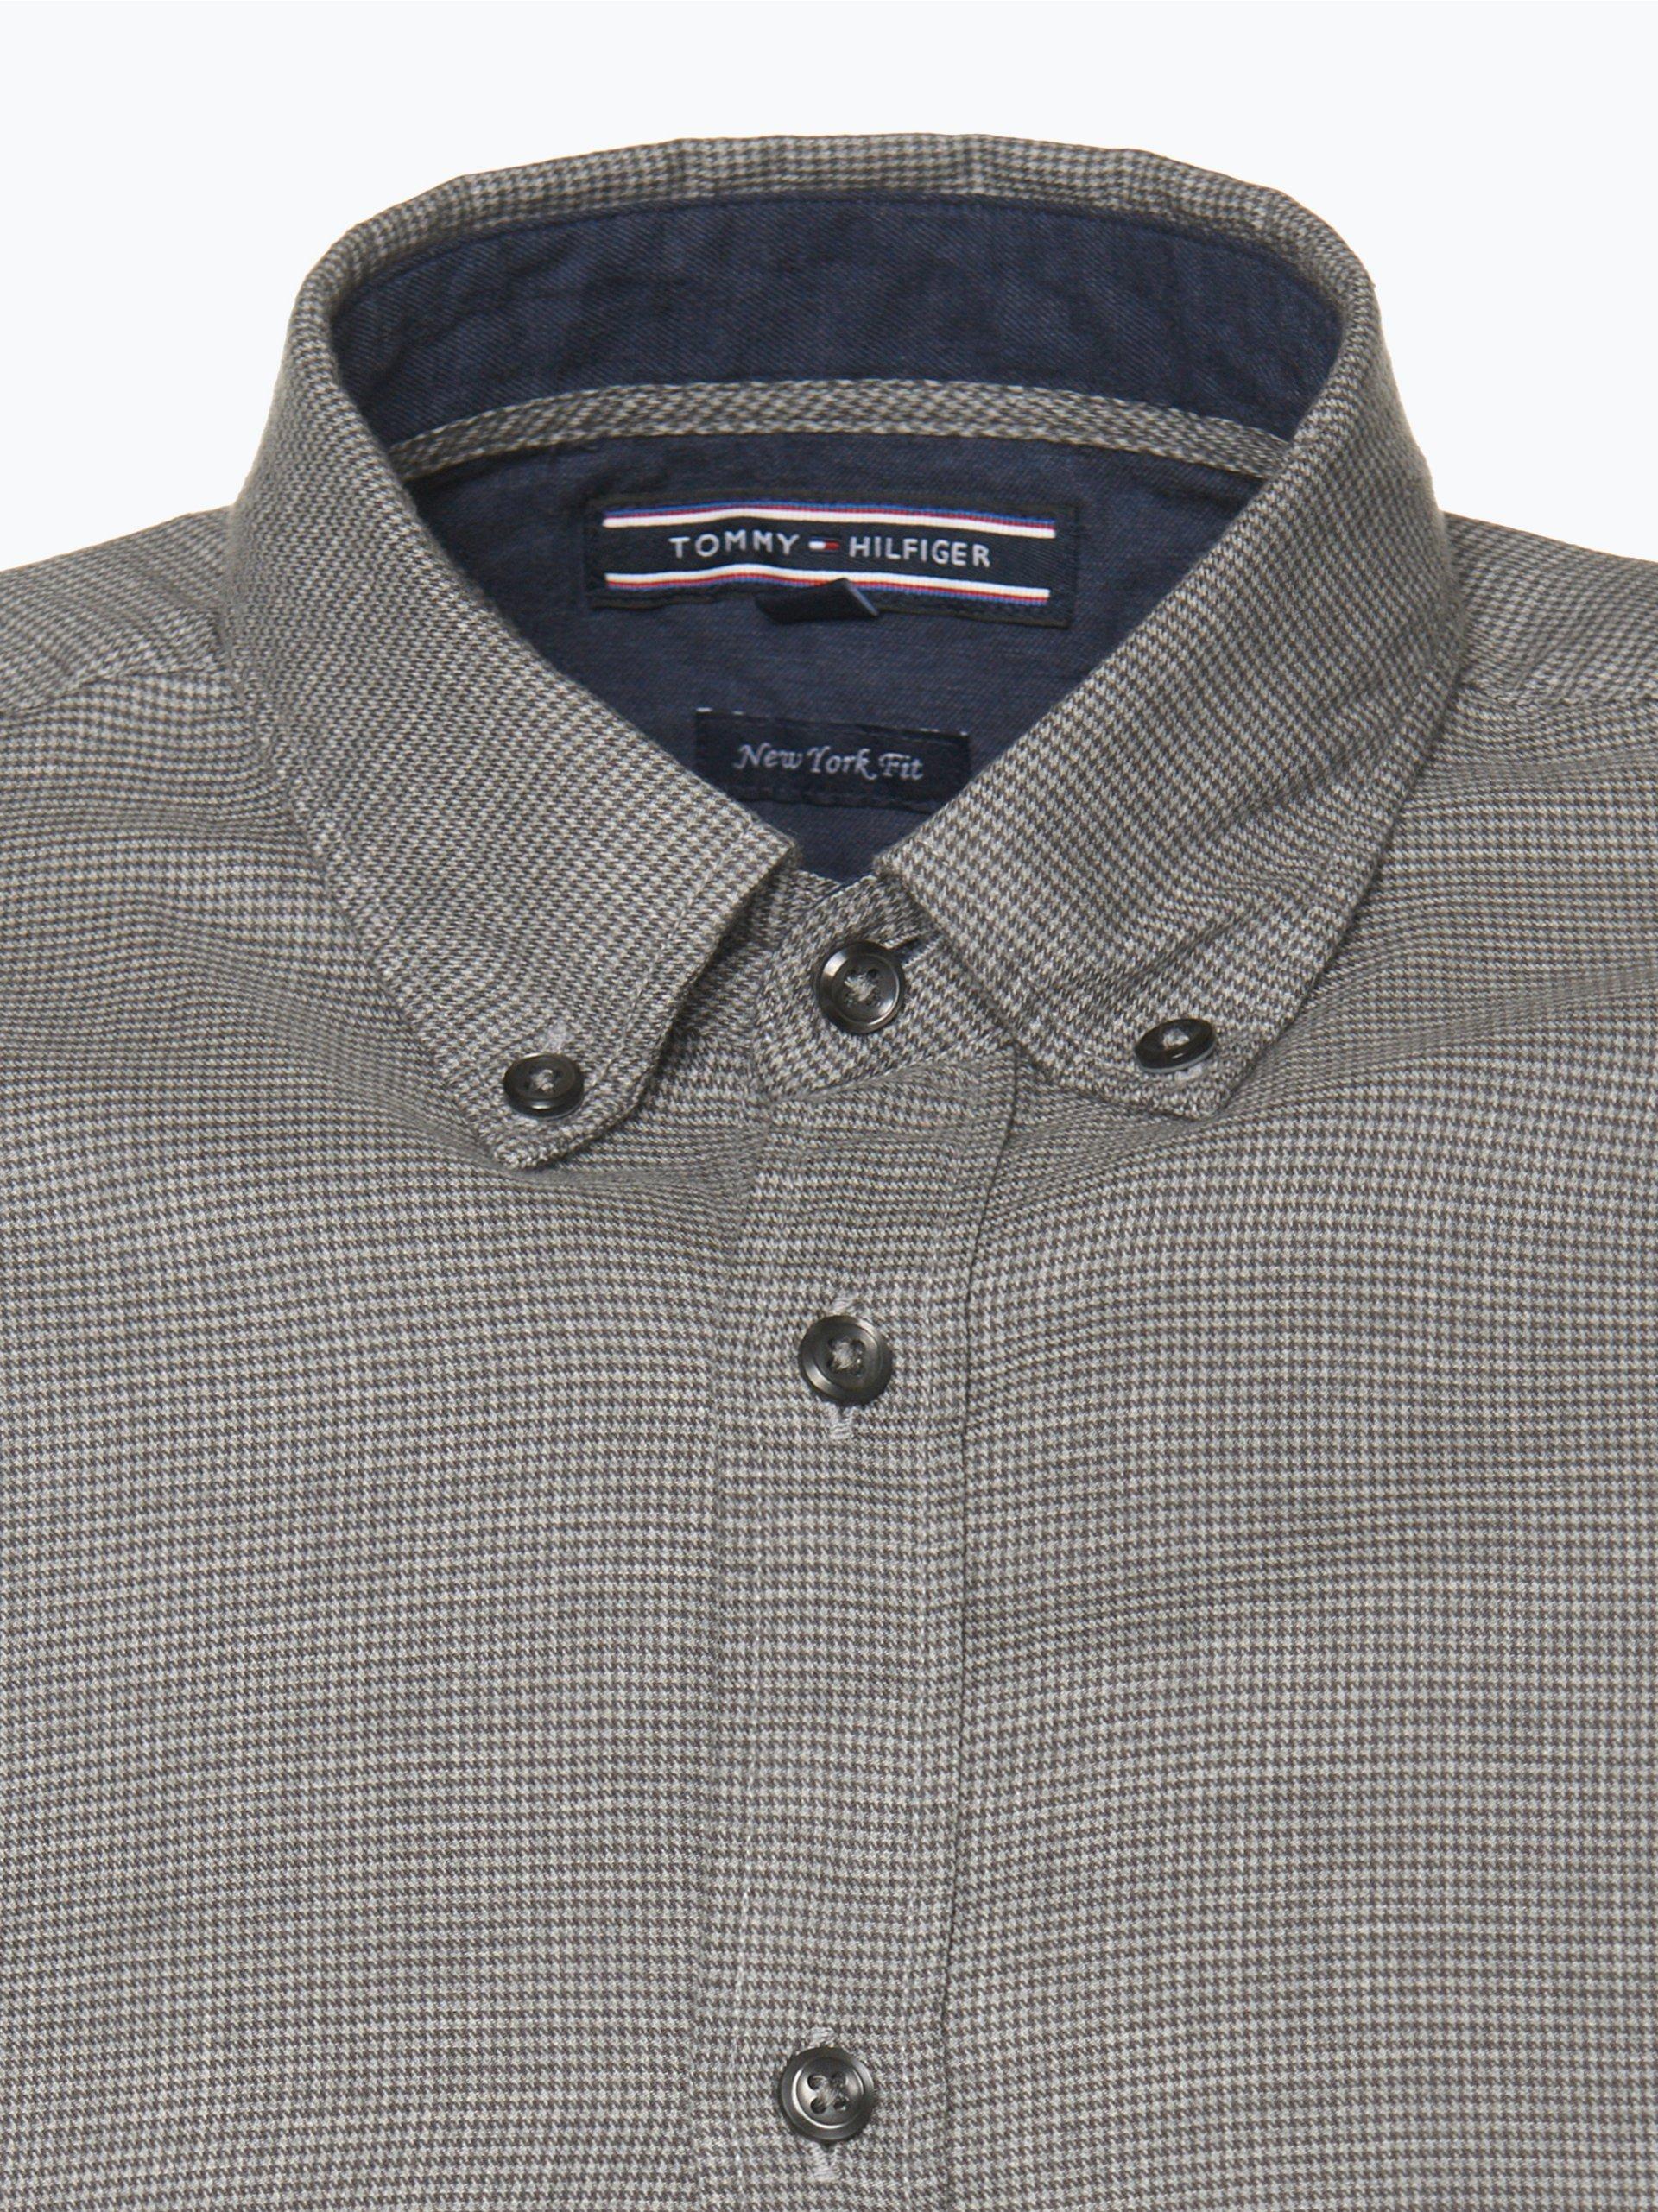 tommy hilfiger herren hemd ecru gemustert online kaufen. Black Bedroom Furniture Sets. Home Design Ideas